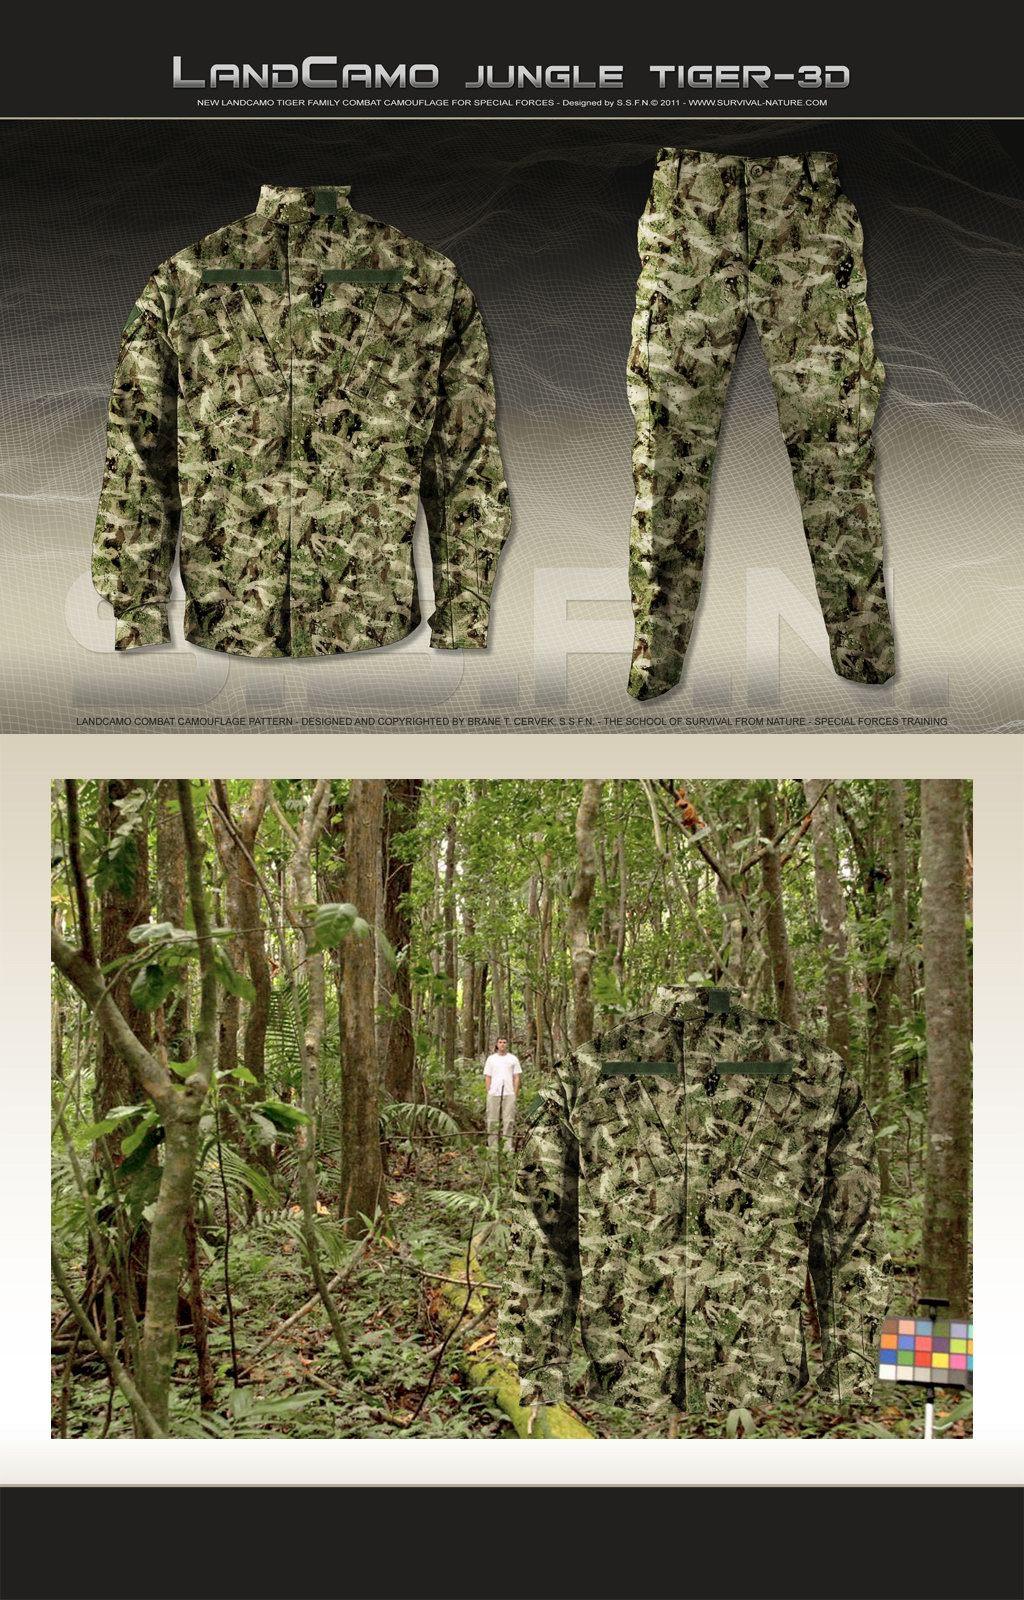 SSFN LandCamo Jungle Tiger 3D Combat Camouflage Pattern 1 <!  :en  >SSFN ExtremePro LandCamo Terrain Specific/Mission Specific Digital Combat Camouflage Patterns <!  :  >